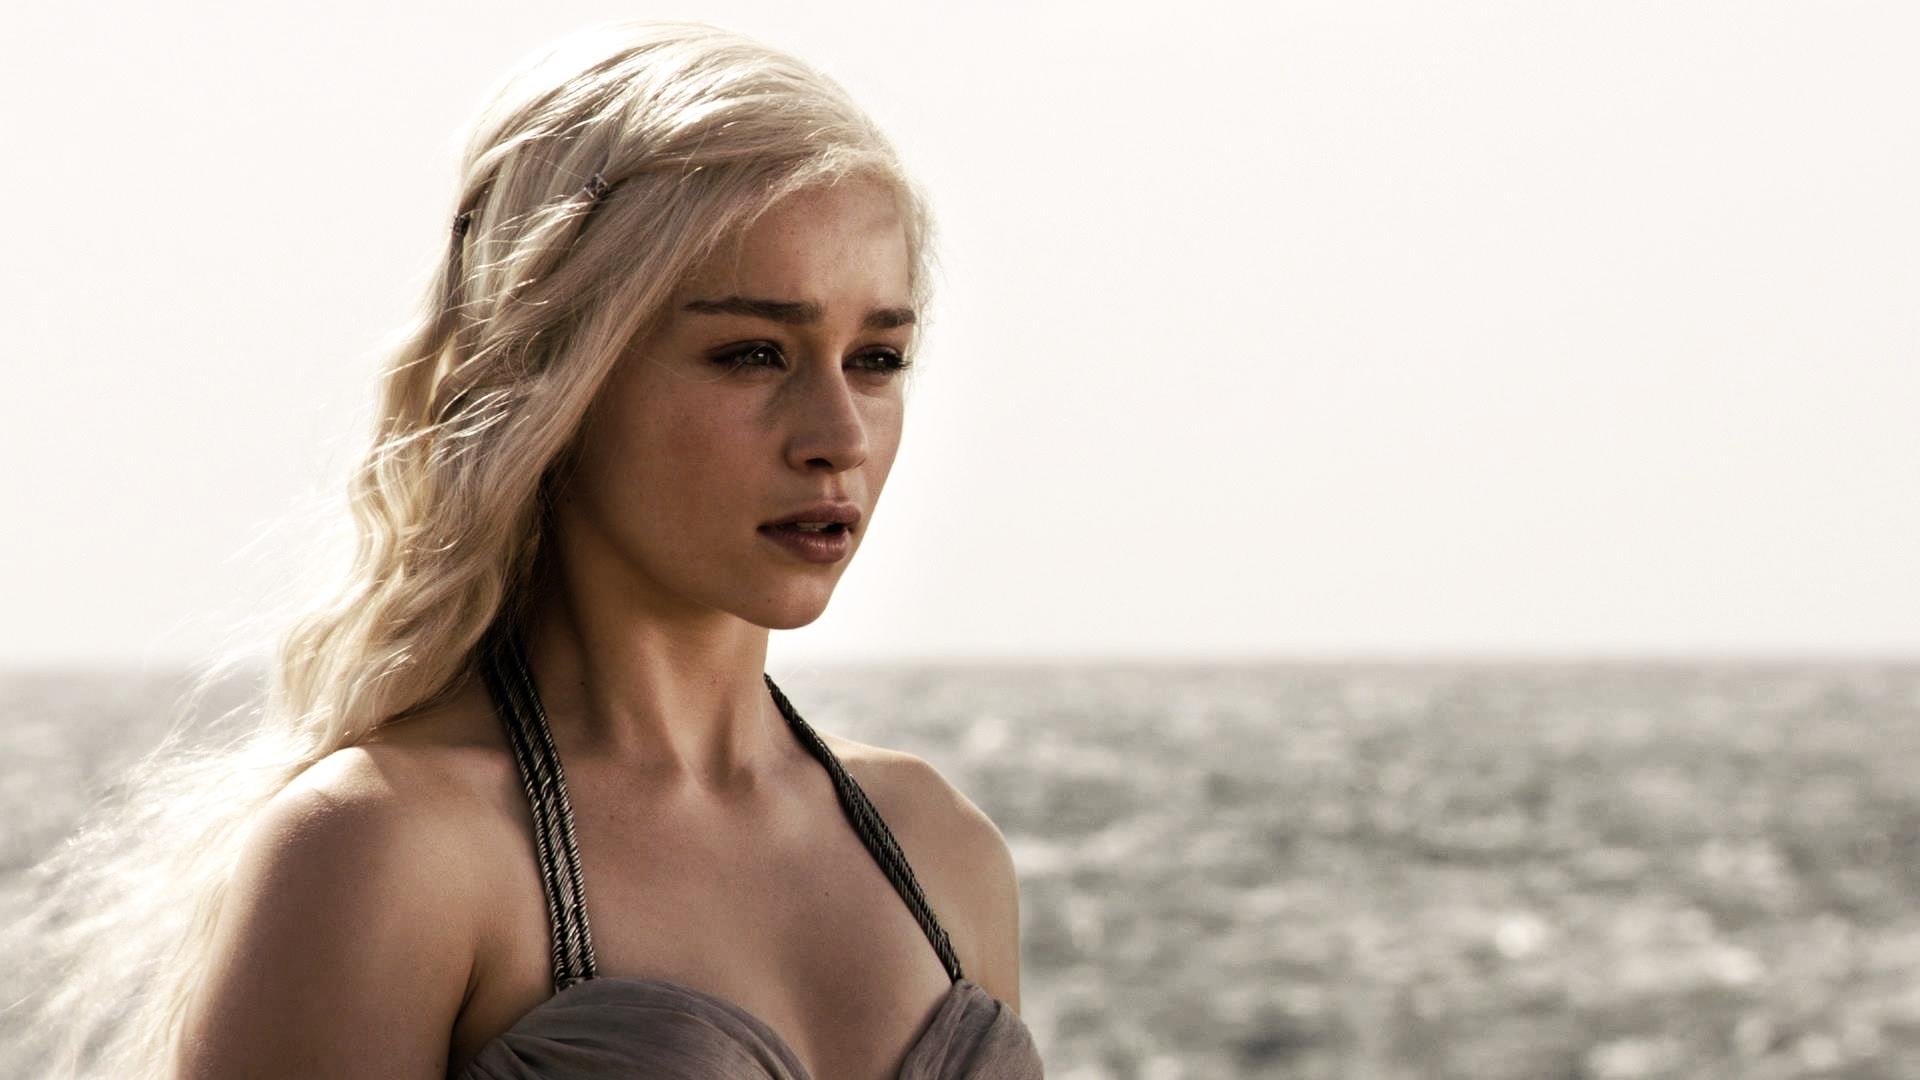 Wallpaper Game Of Thrones Daenerys Targaryen Emilia Clarke